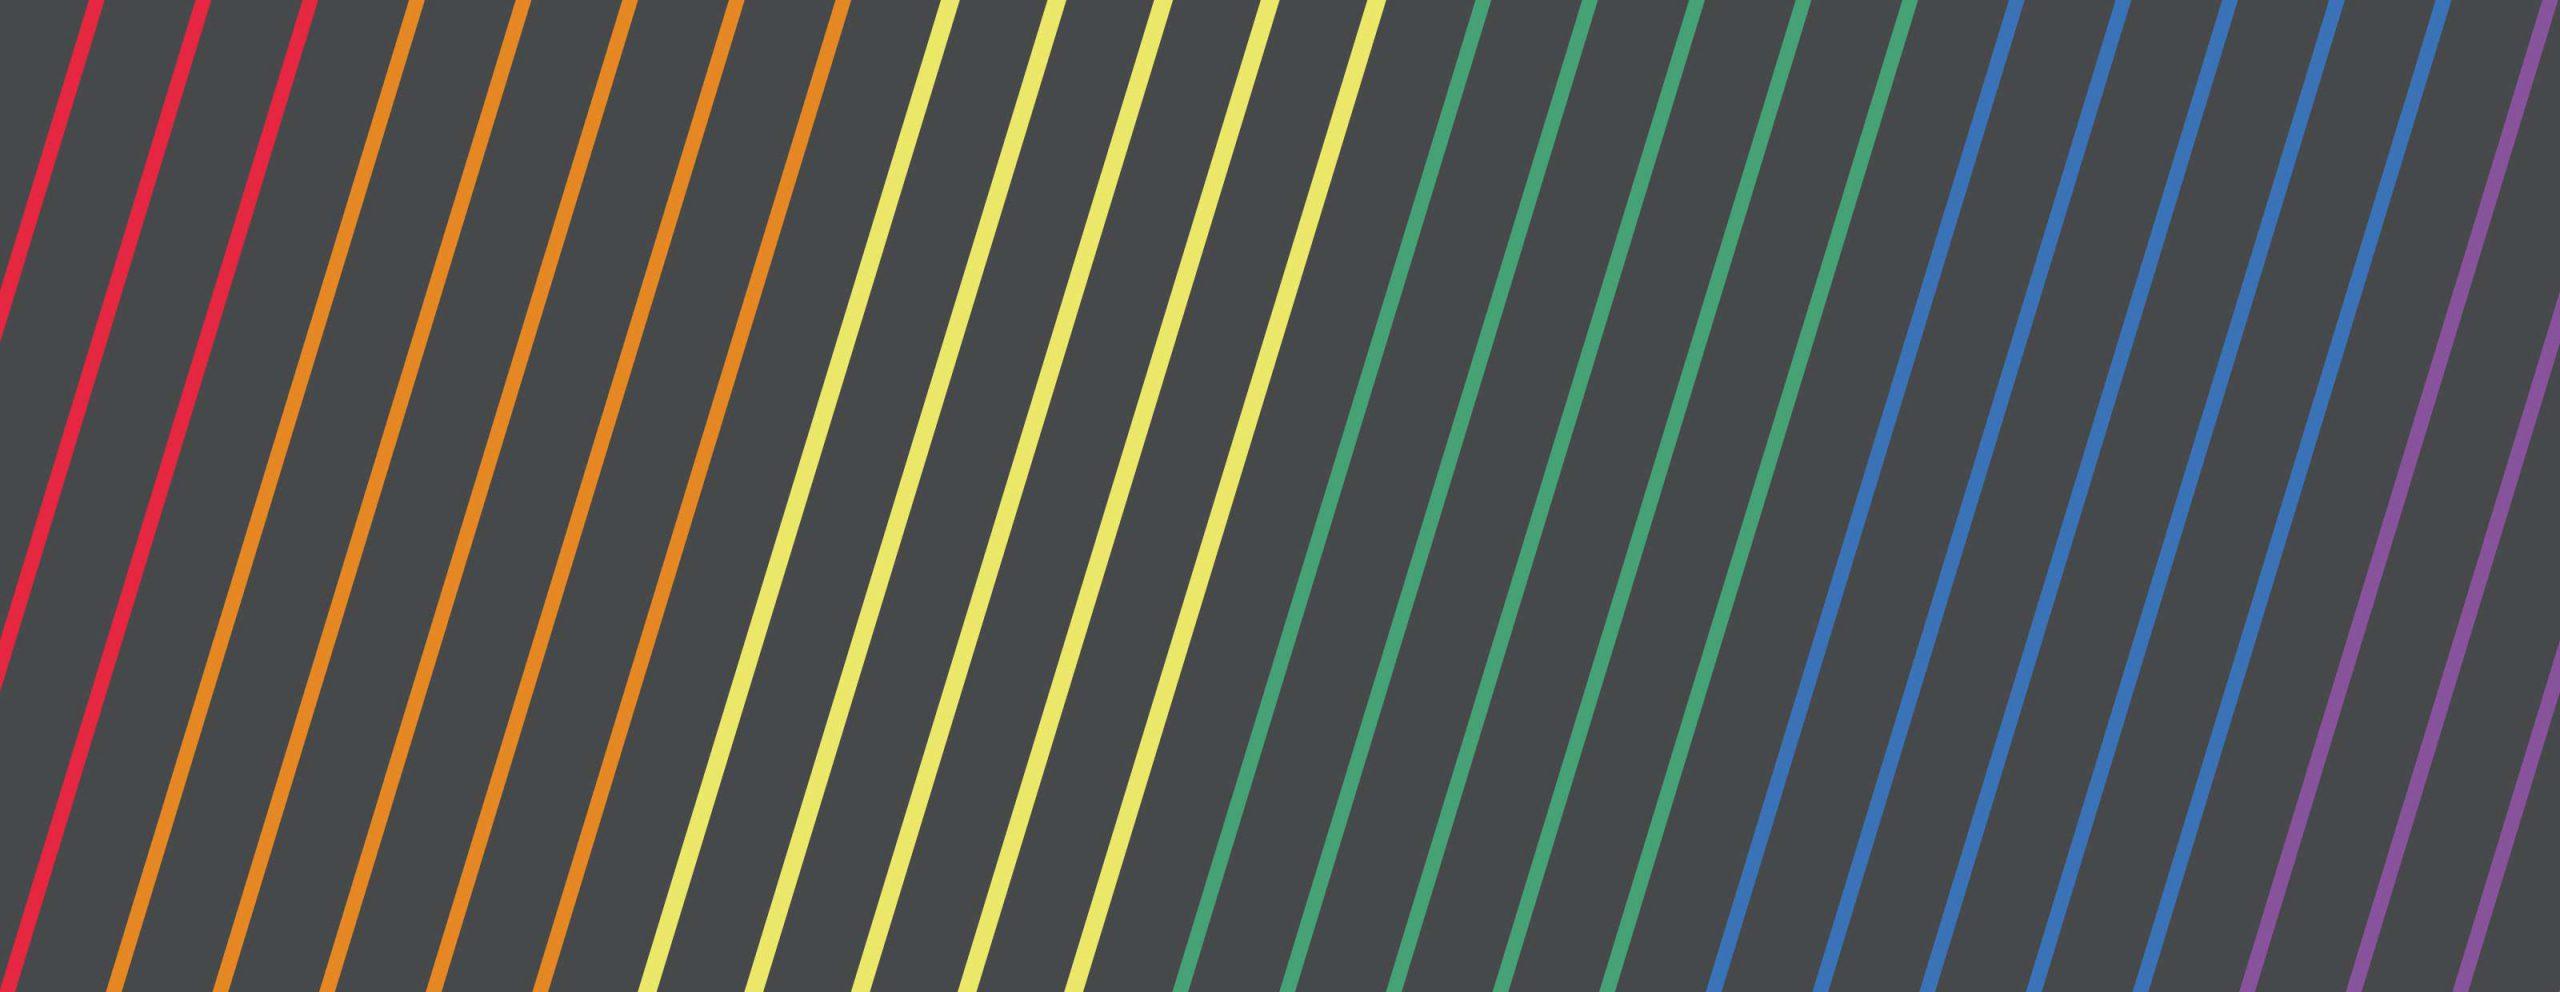 gayborhood stripes image